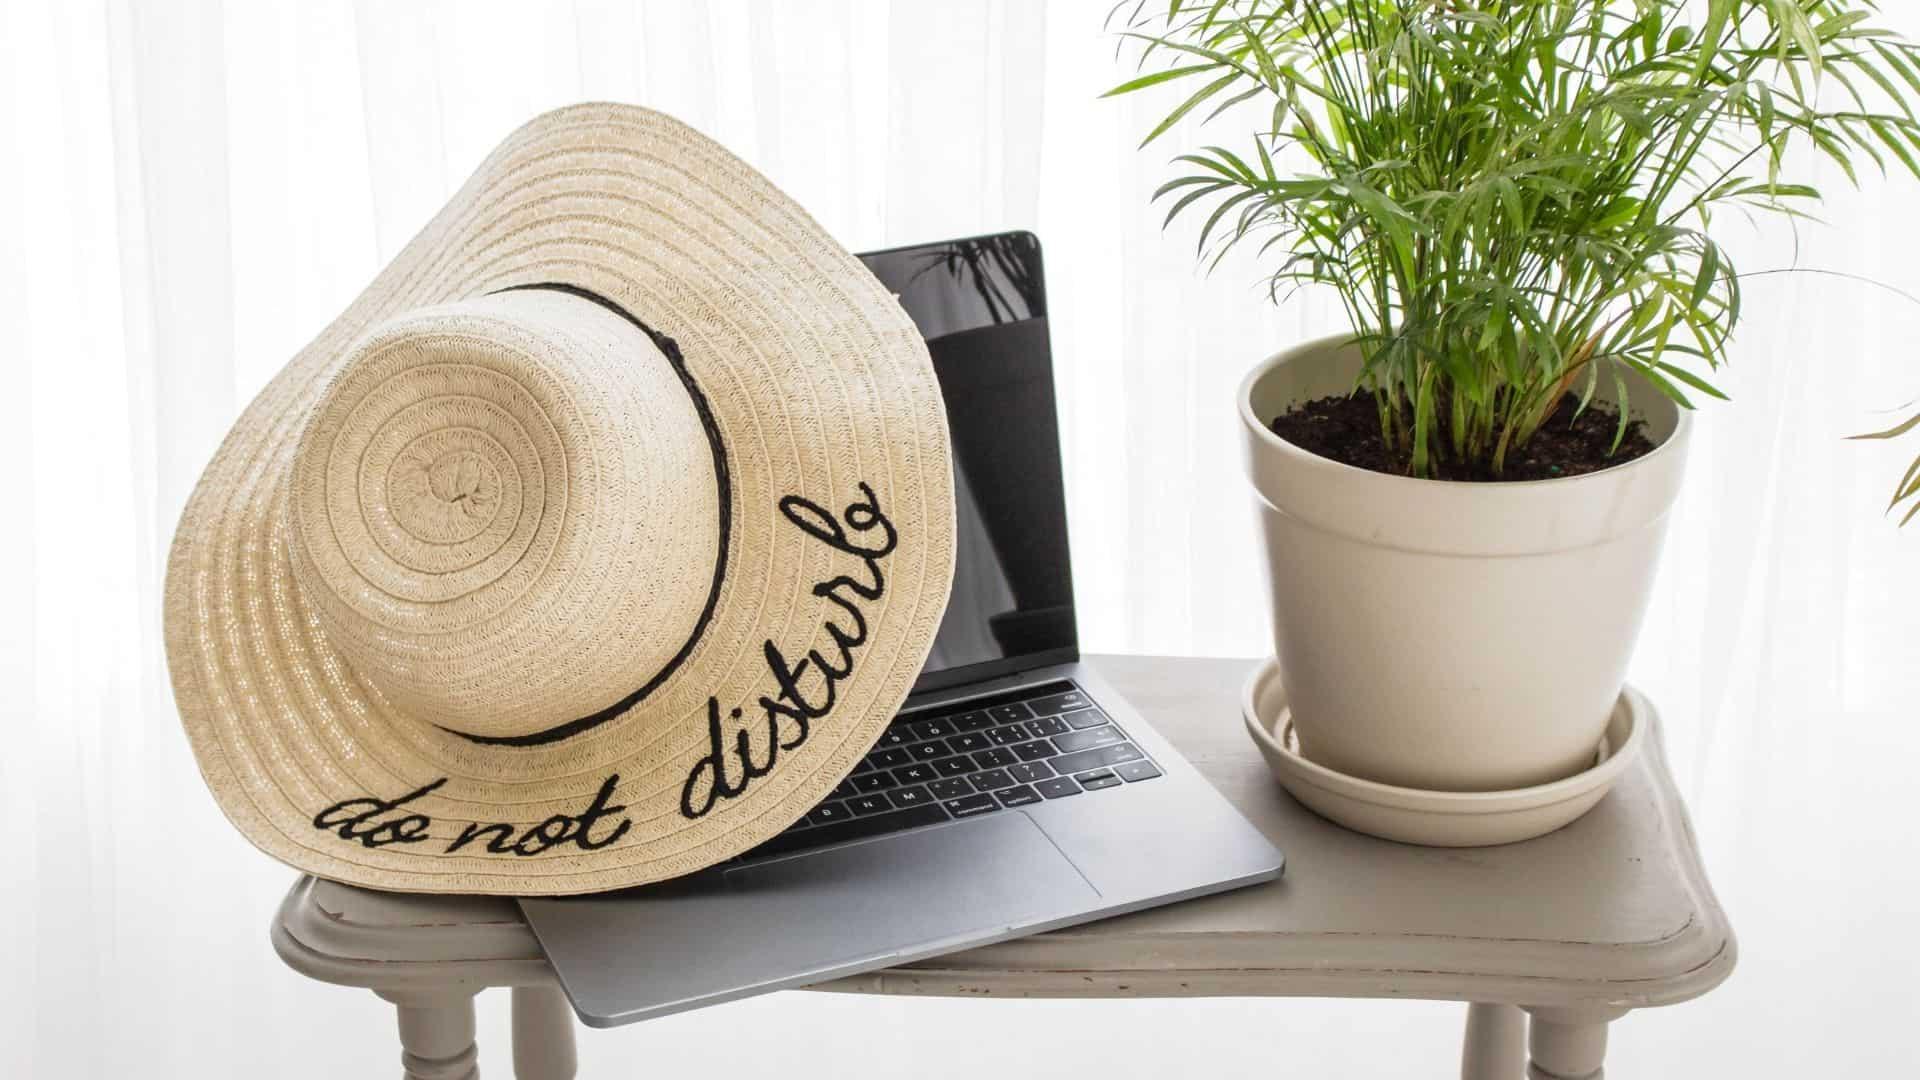 do not disturb had on a laptop